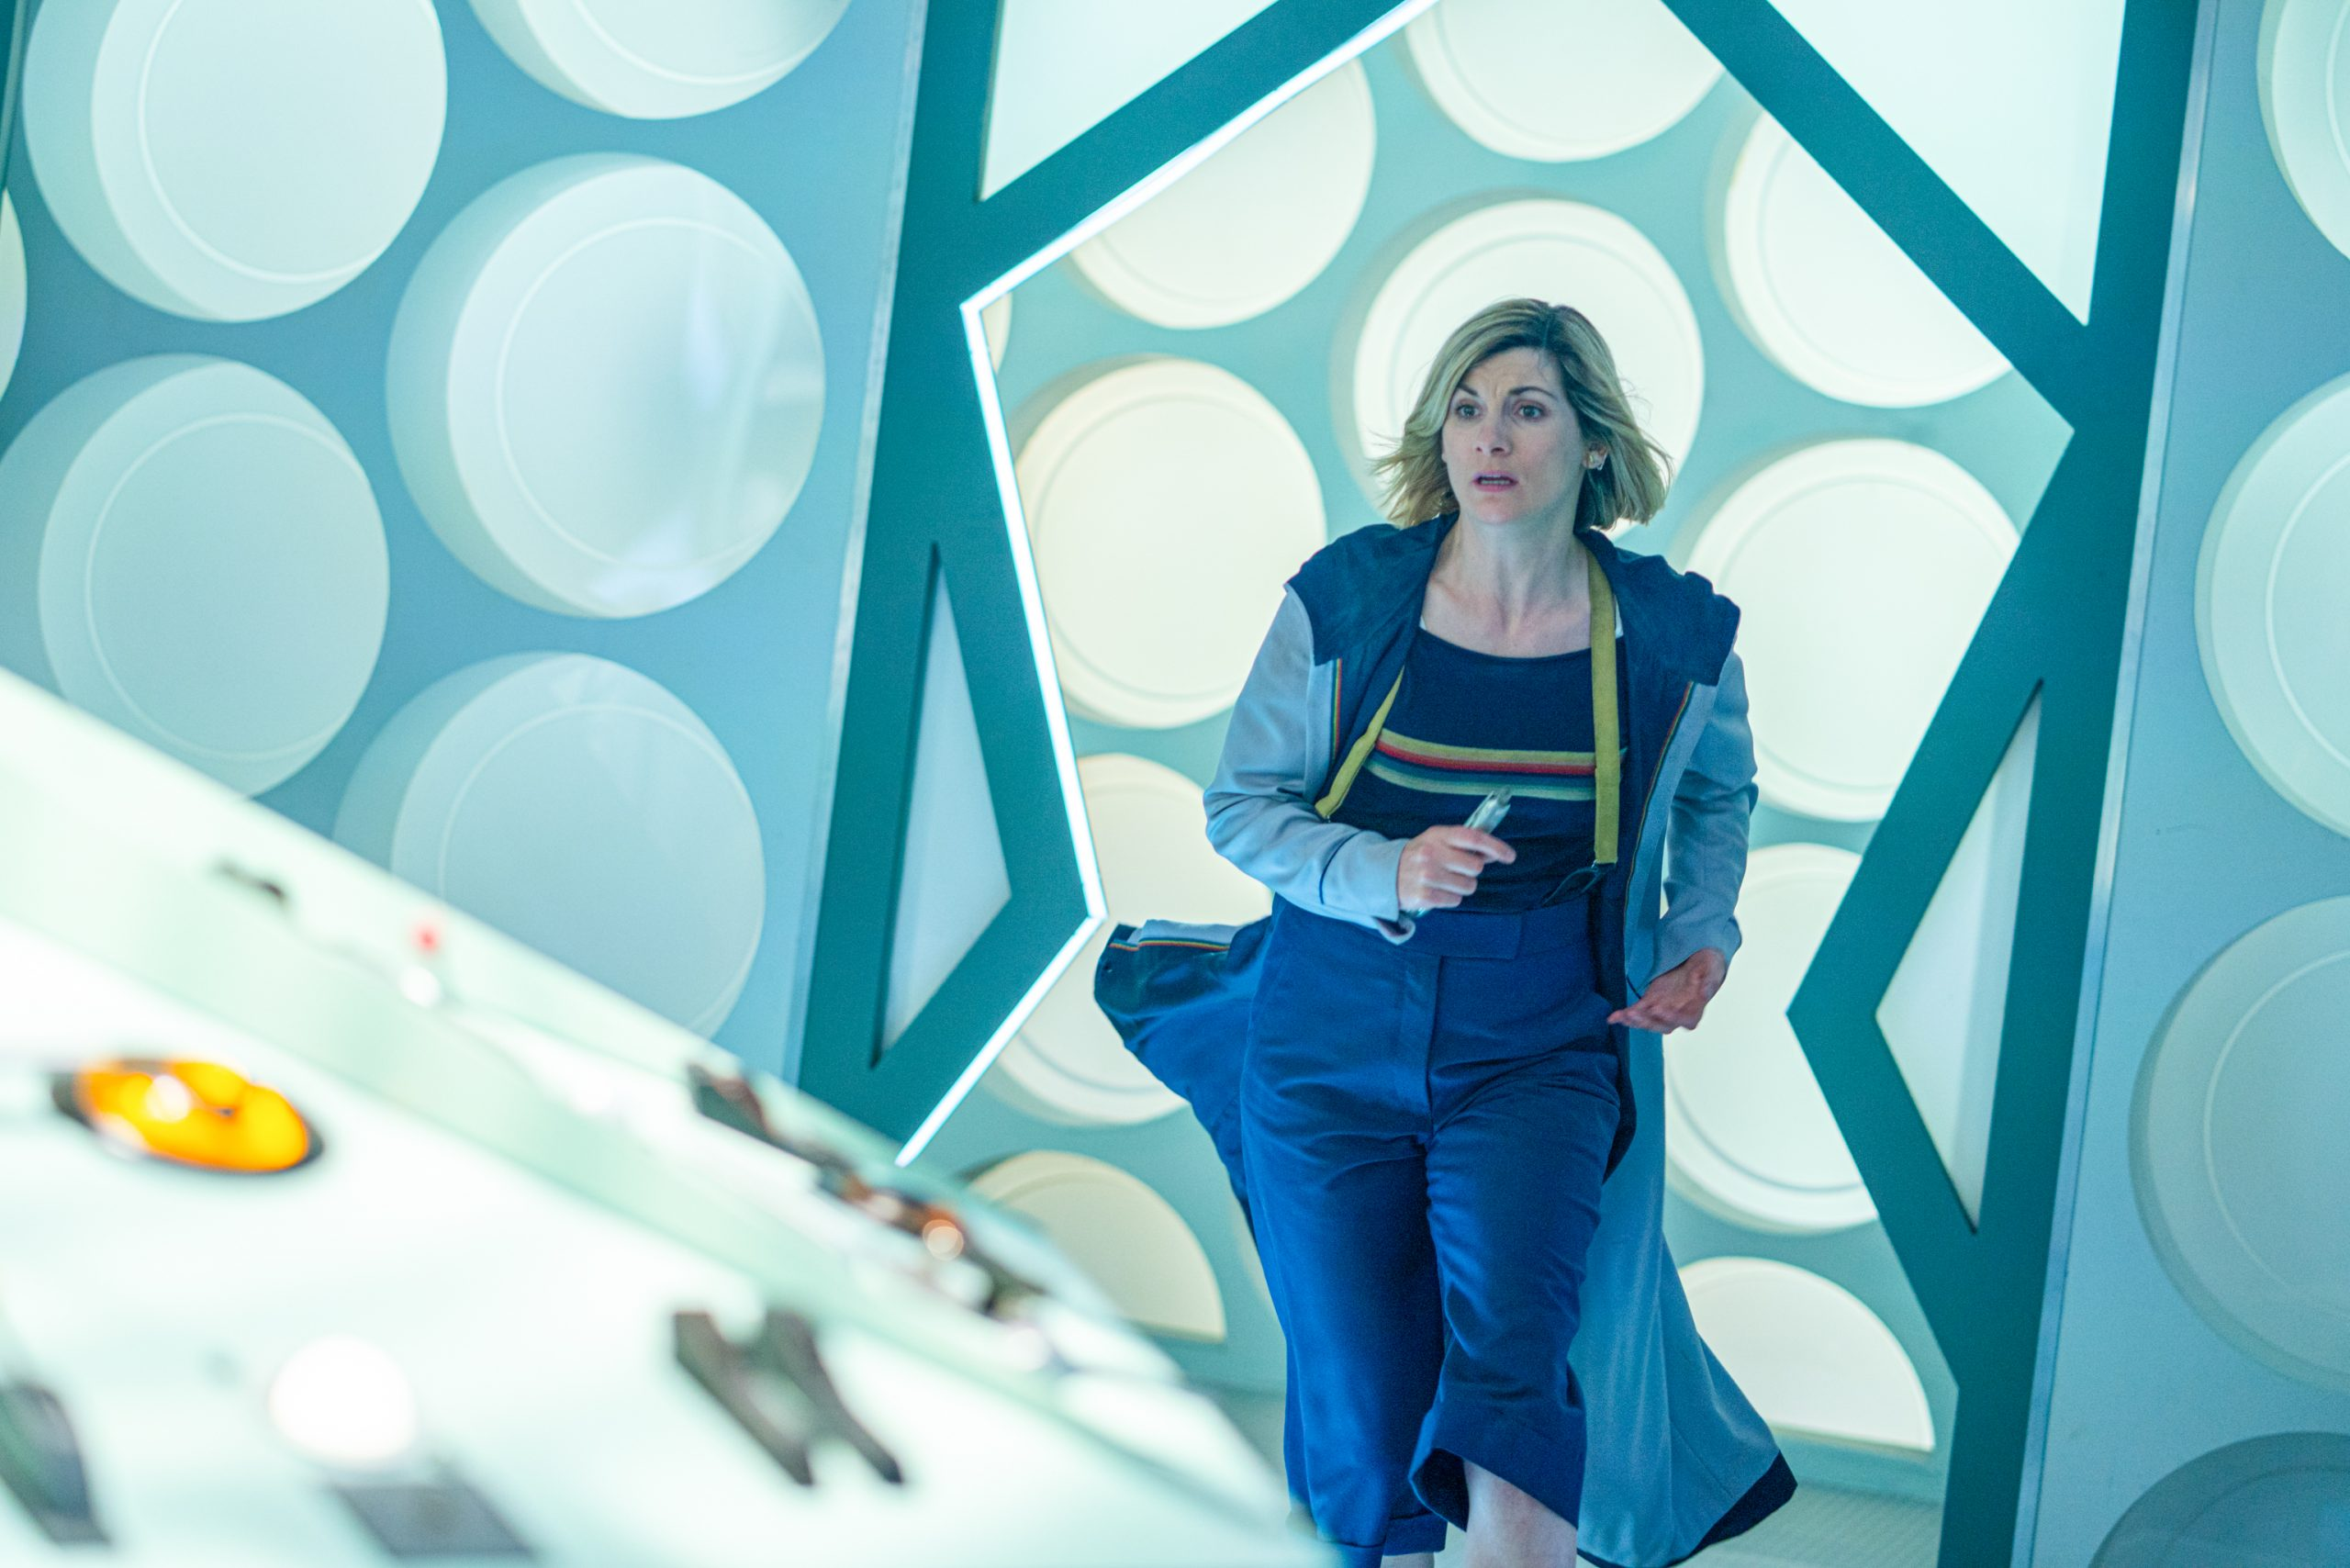 Doctor Who - Spyfall - S12E2 - Ryan (TOSIN COLE) - (C) BBC / BBC Studios - Photographer: Ray Burmiston